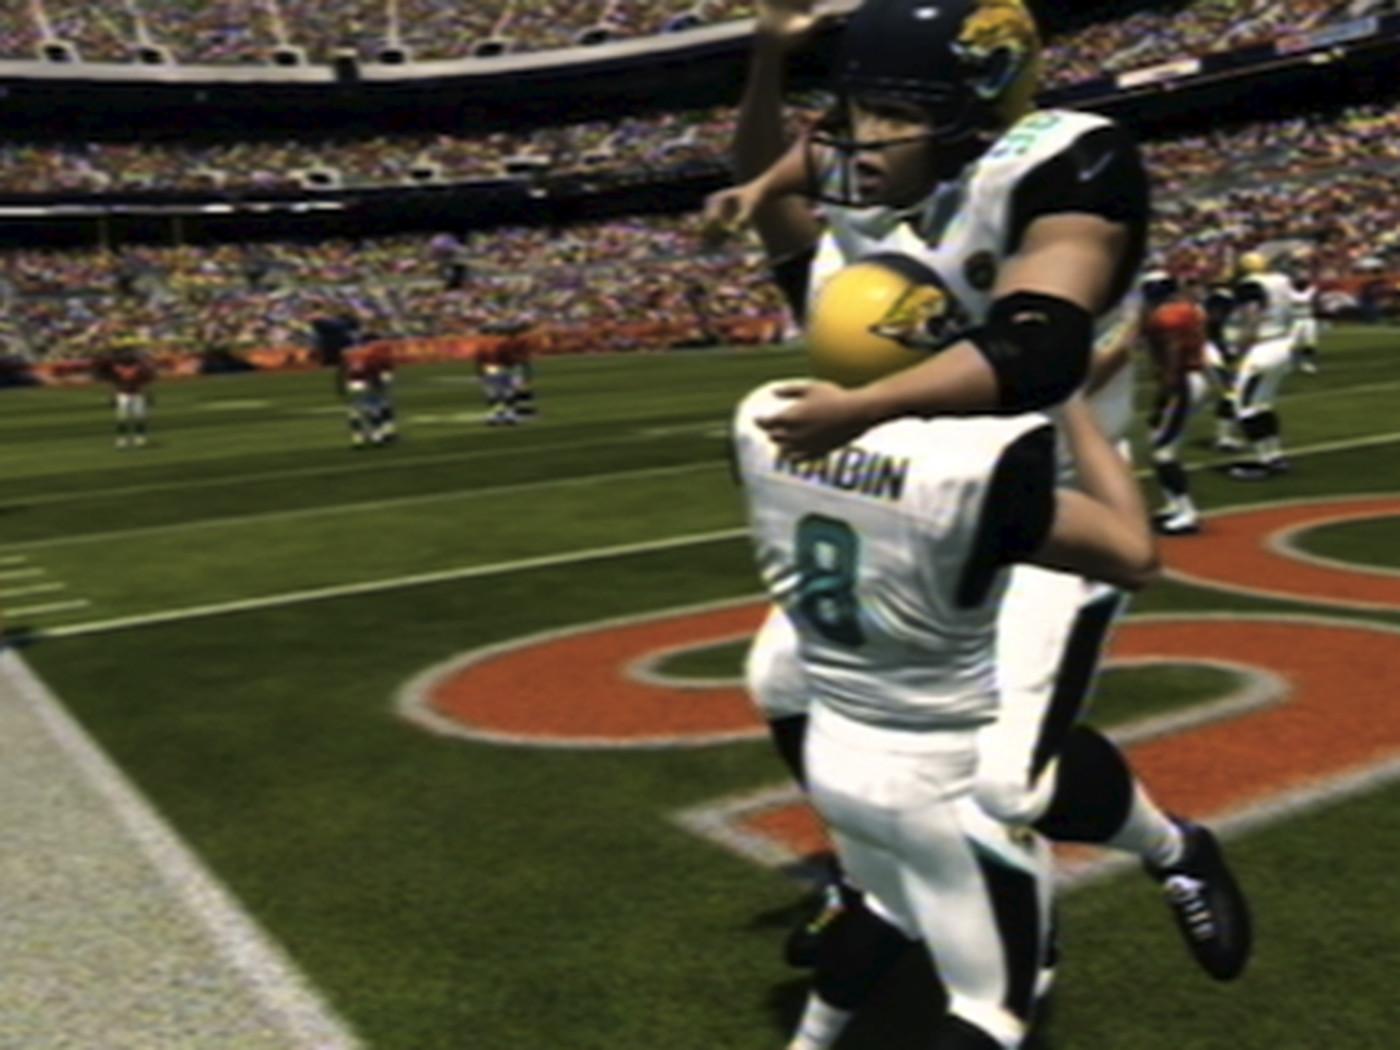 Breaking Madden: The return of BEEFTANK, the Jaguars' 5-foot, 400-pound  quarterback - SBNation.com